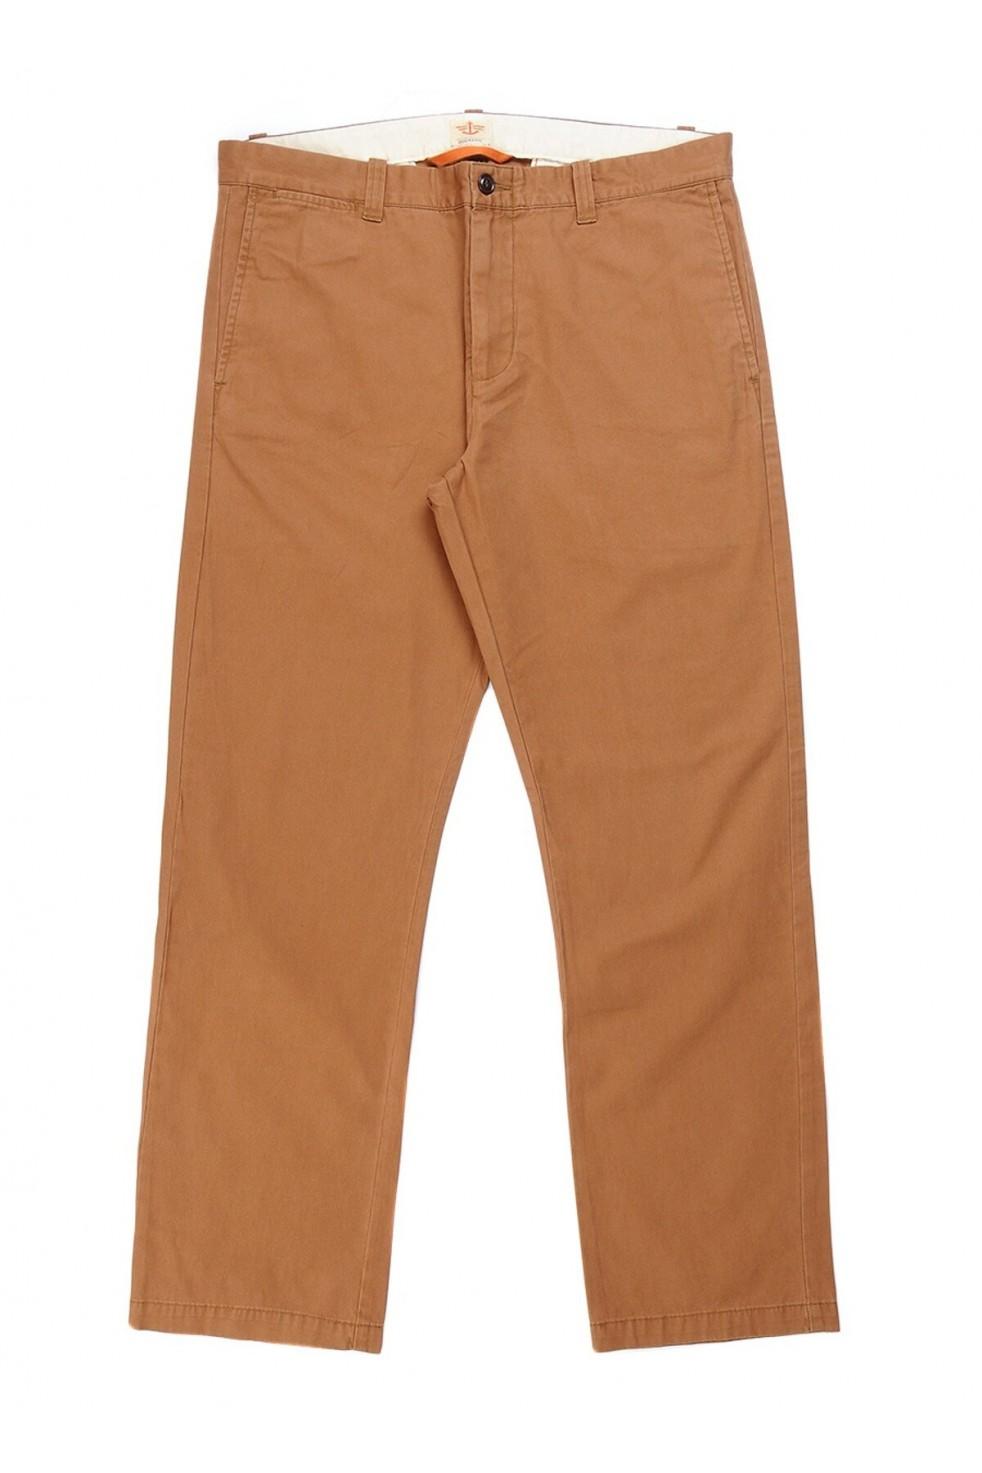 Dockers Erkek Pantolon Standart Fit 49819-0027